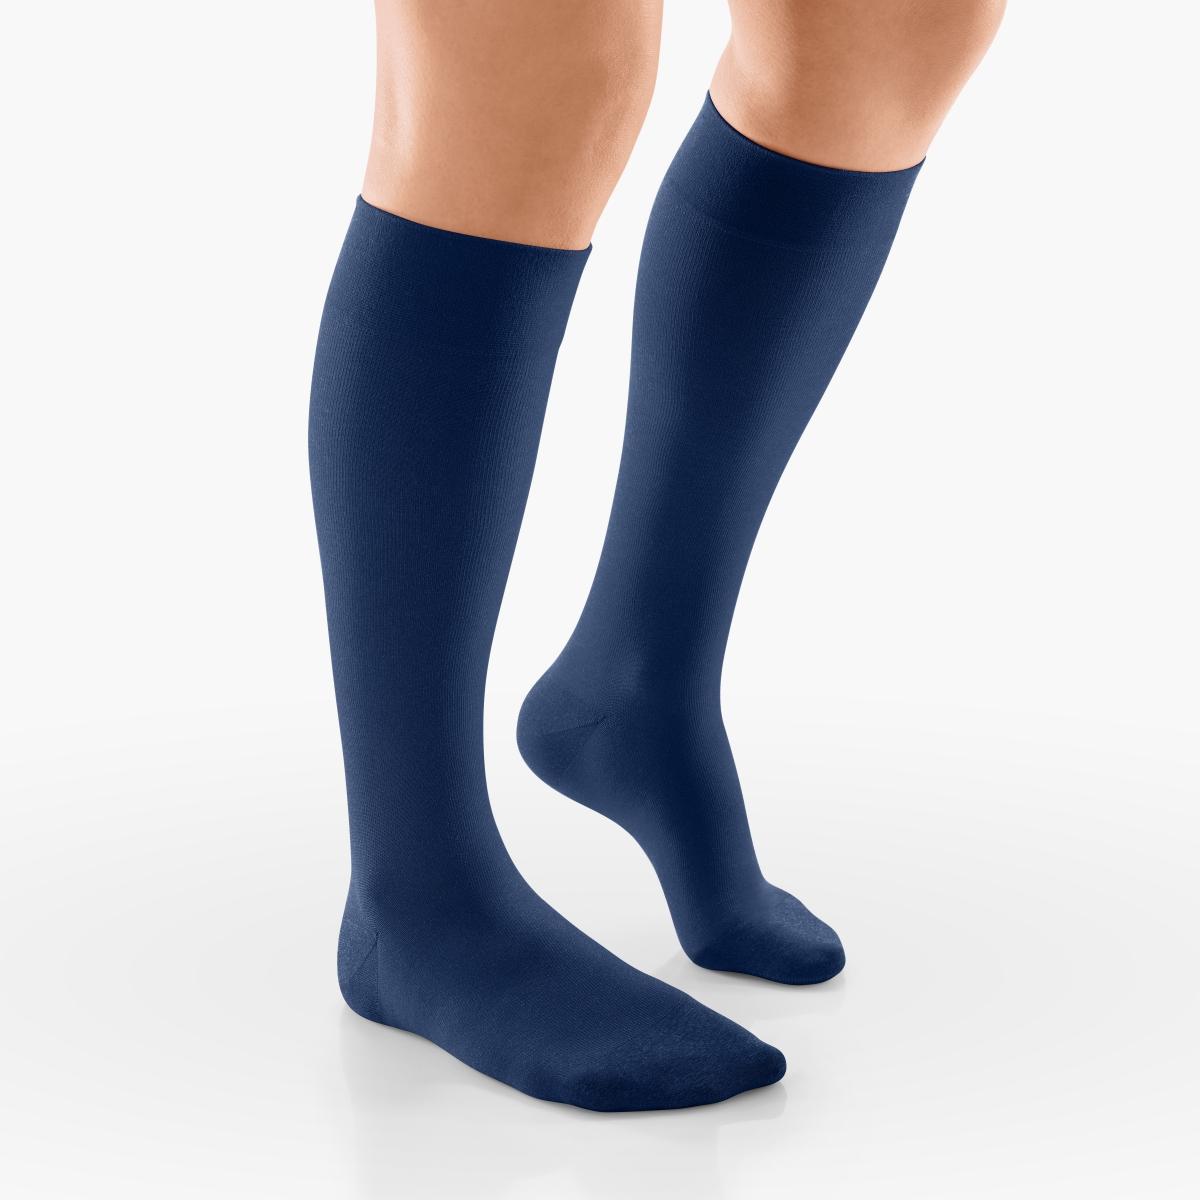 Venosan Silk Support 15-20mm Hg marine Small closed toe Moderate 15-20 mmHg   Marine   S      Closed Toe   Knit Top